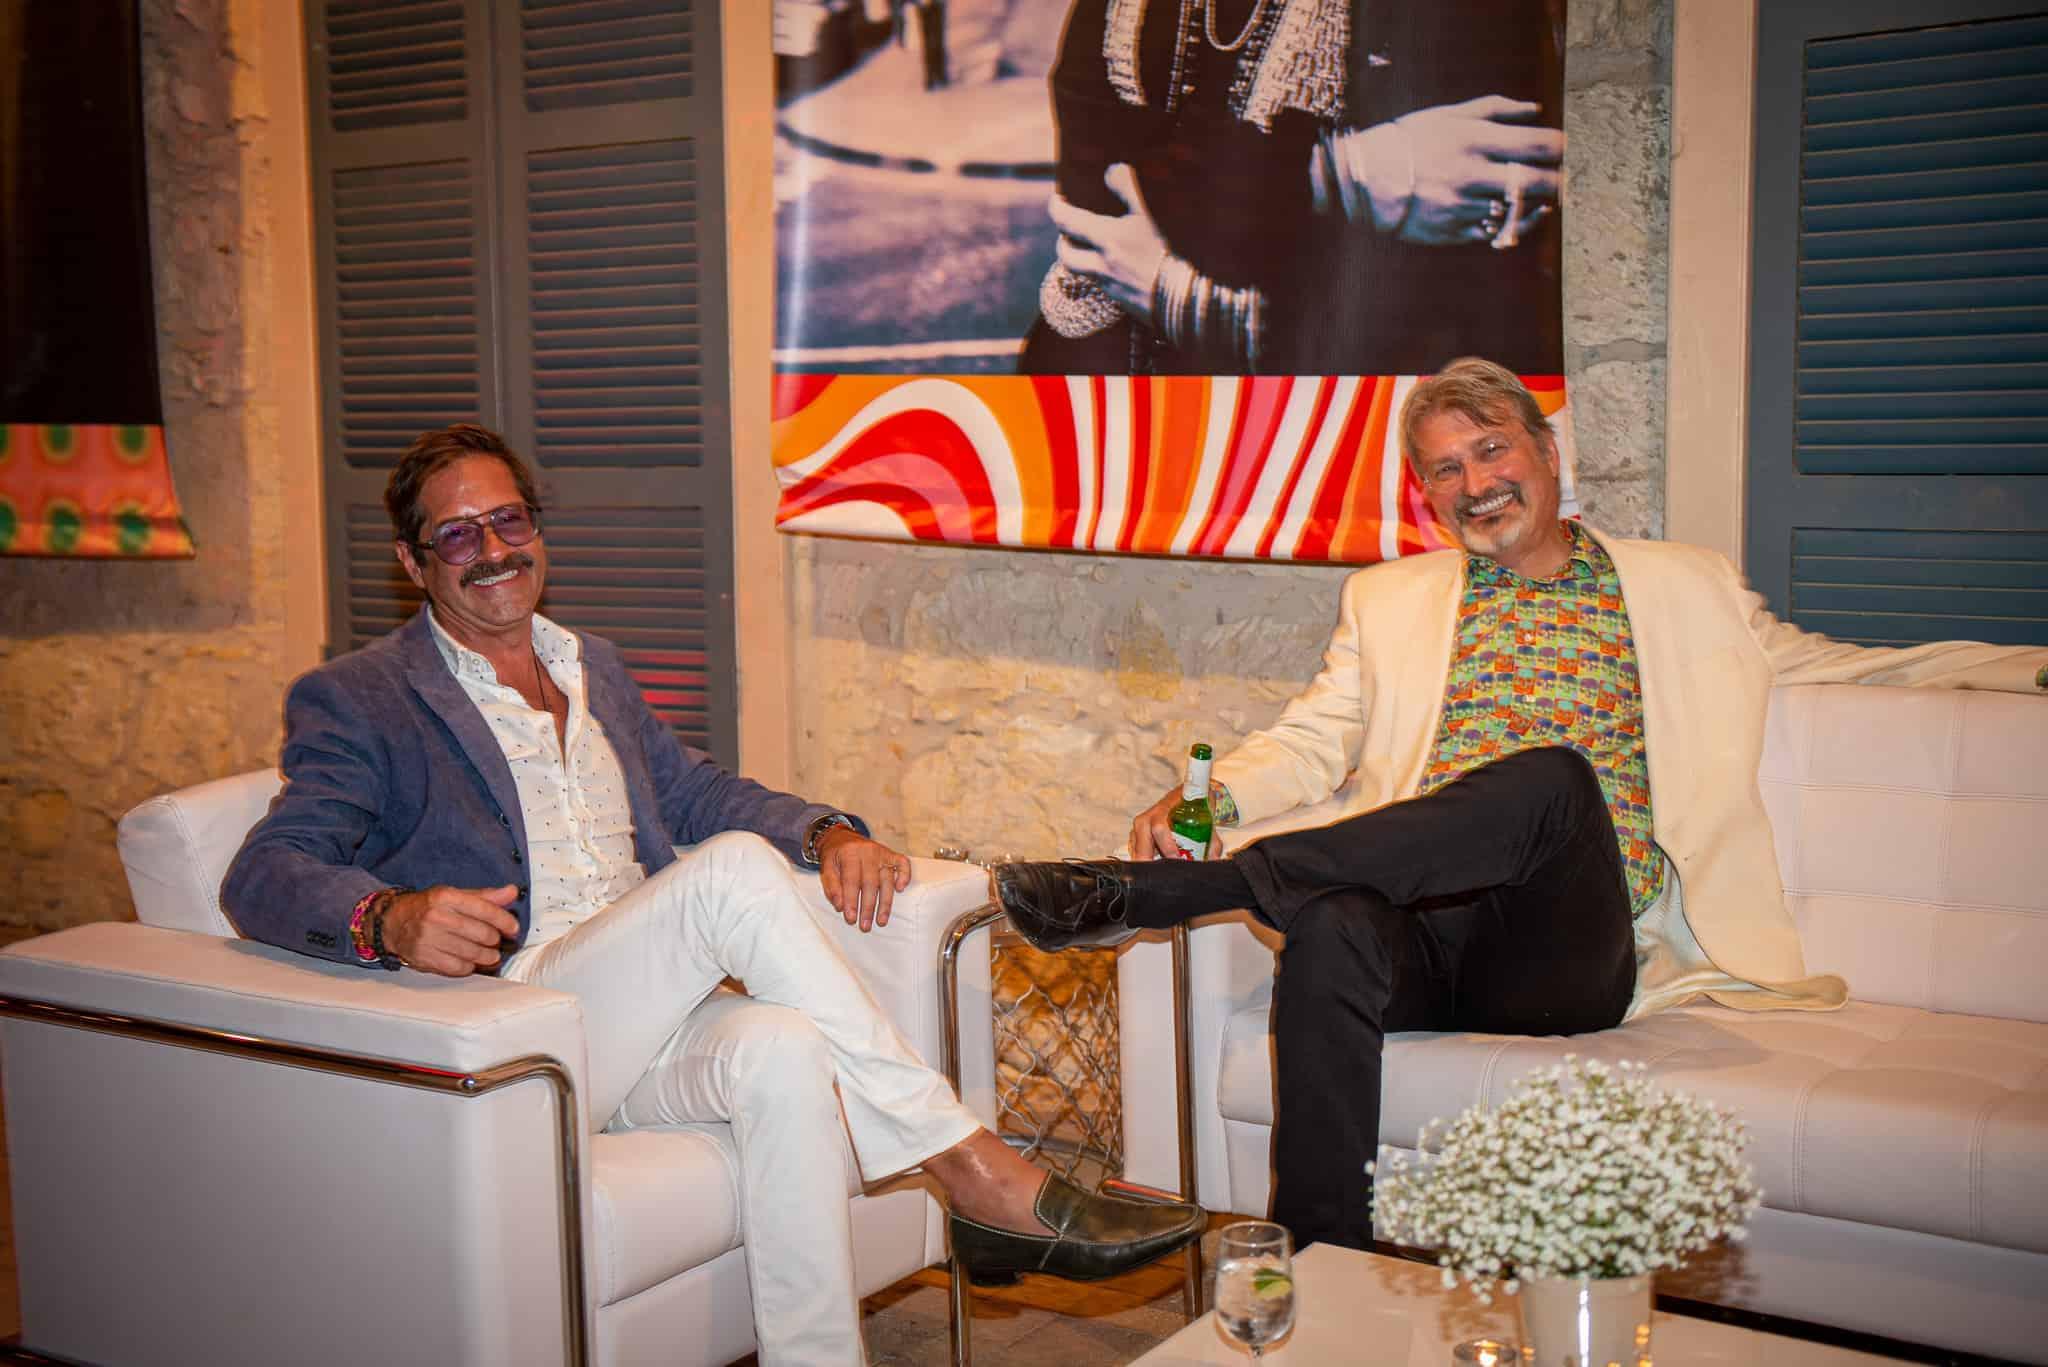 Rudy Choperena and Dr. Joel Dunlop